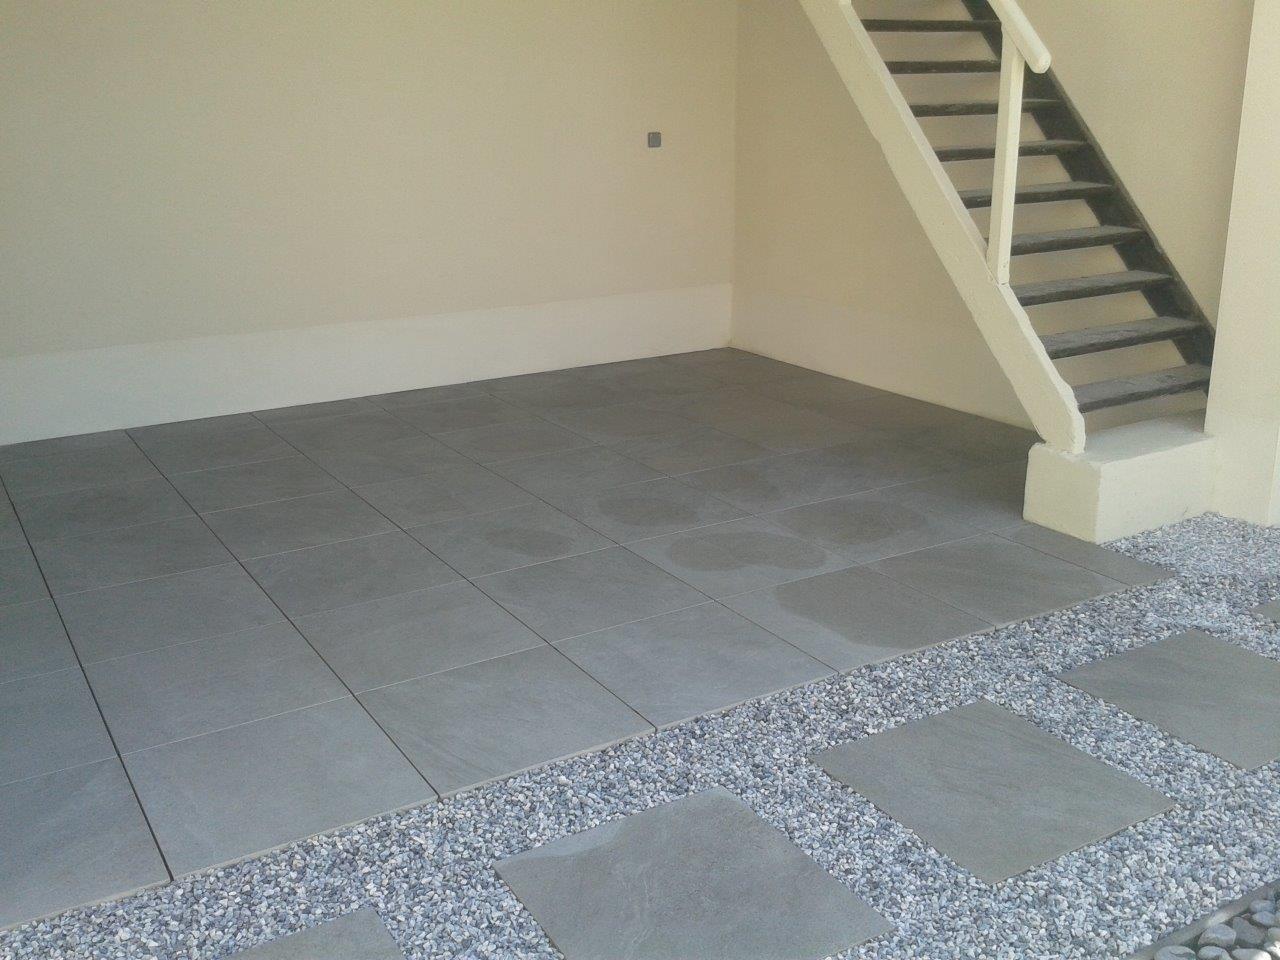 graue steinplatten mit kies bs holzdesign. Black Bedroom Furniture Sets. Home Design Ideas